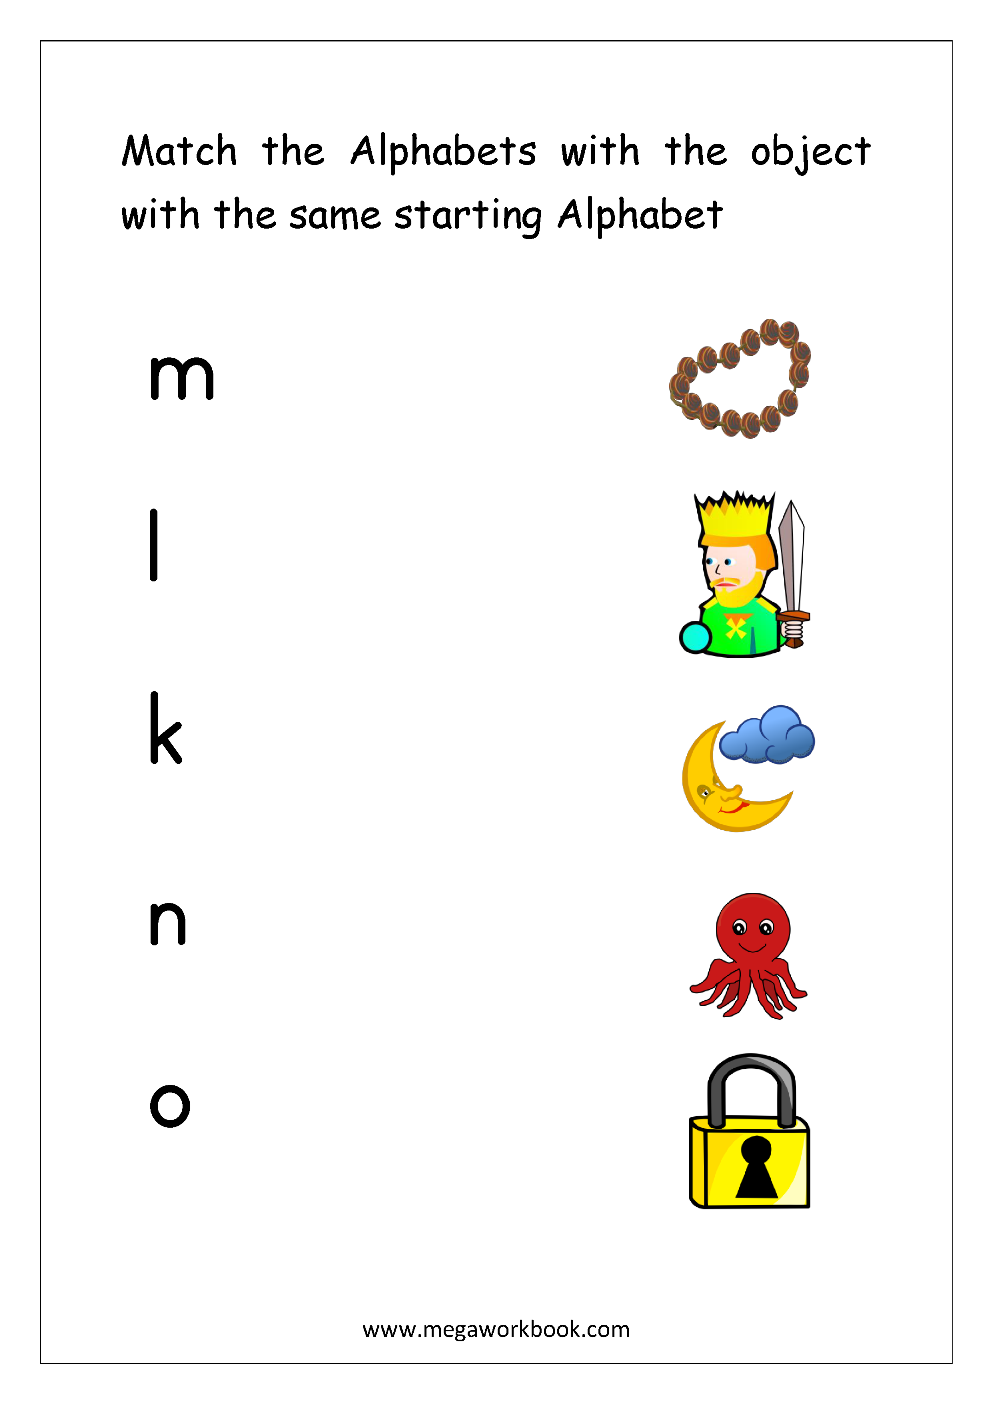 Free English Worksheets Alphabet Matching Megaworkbook Alphabet Matching Alphabet Worksheets Preschool Alphabet Pictures [ 1403 x 992 Pixel ]